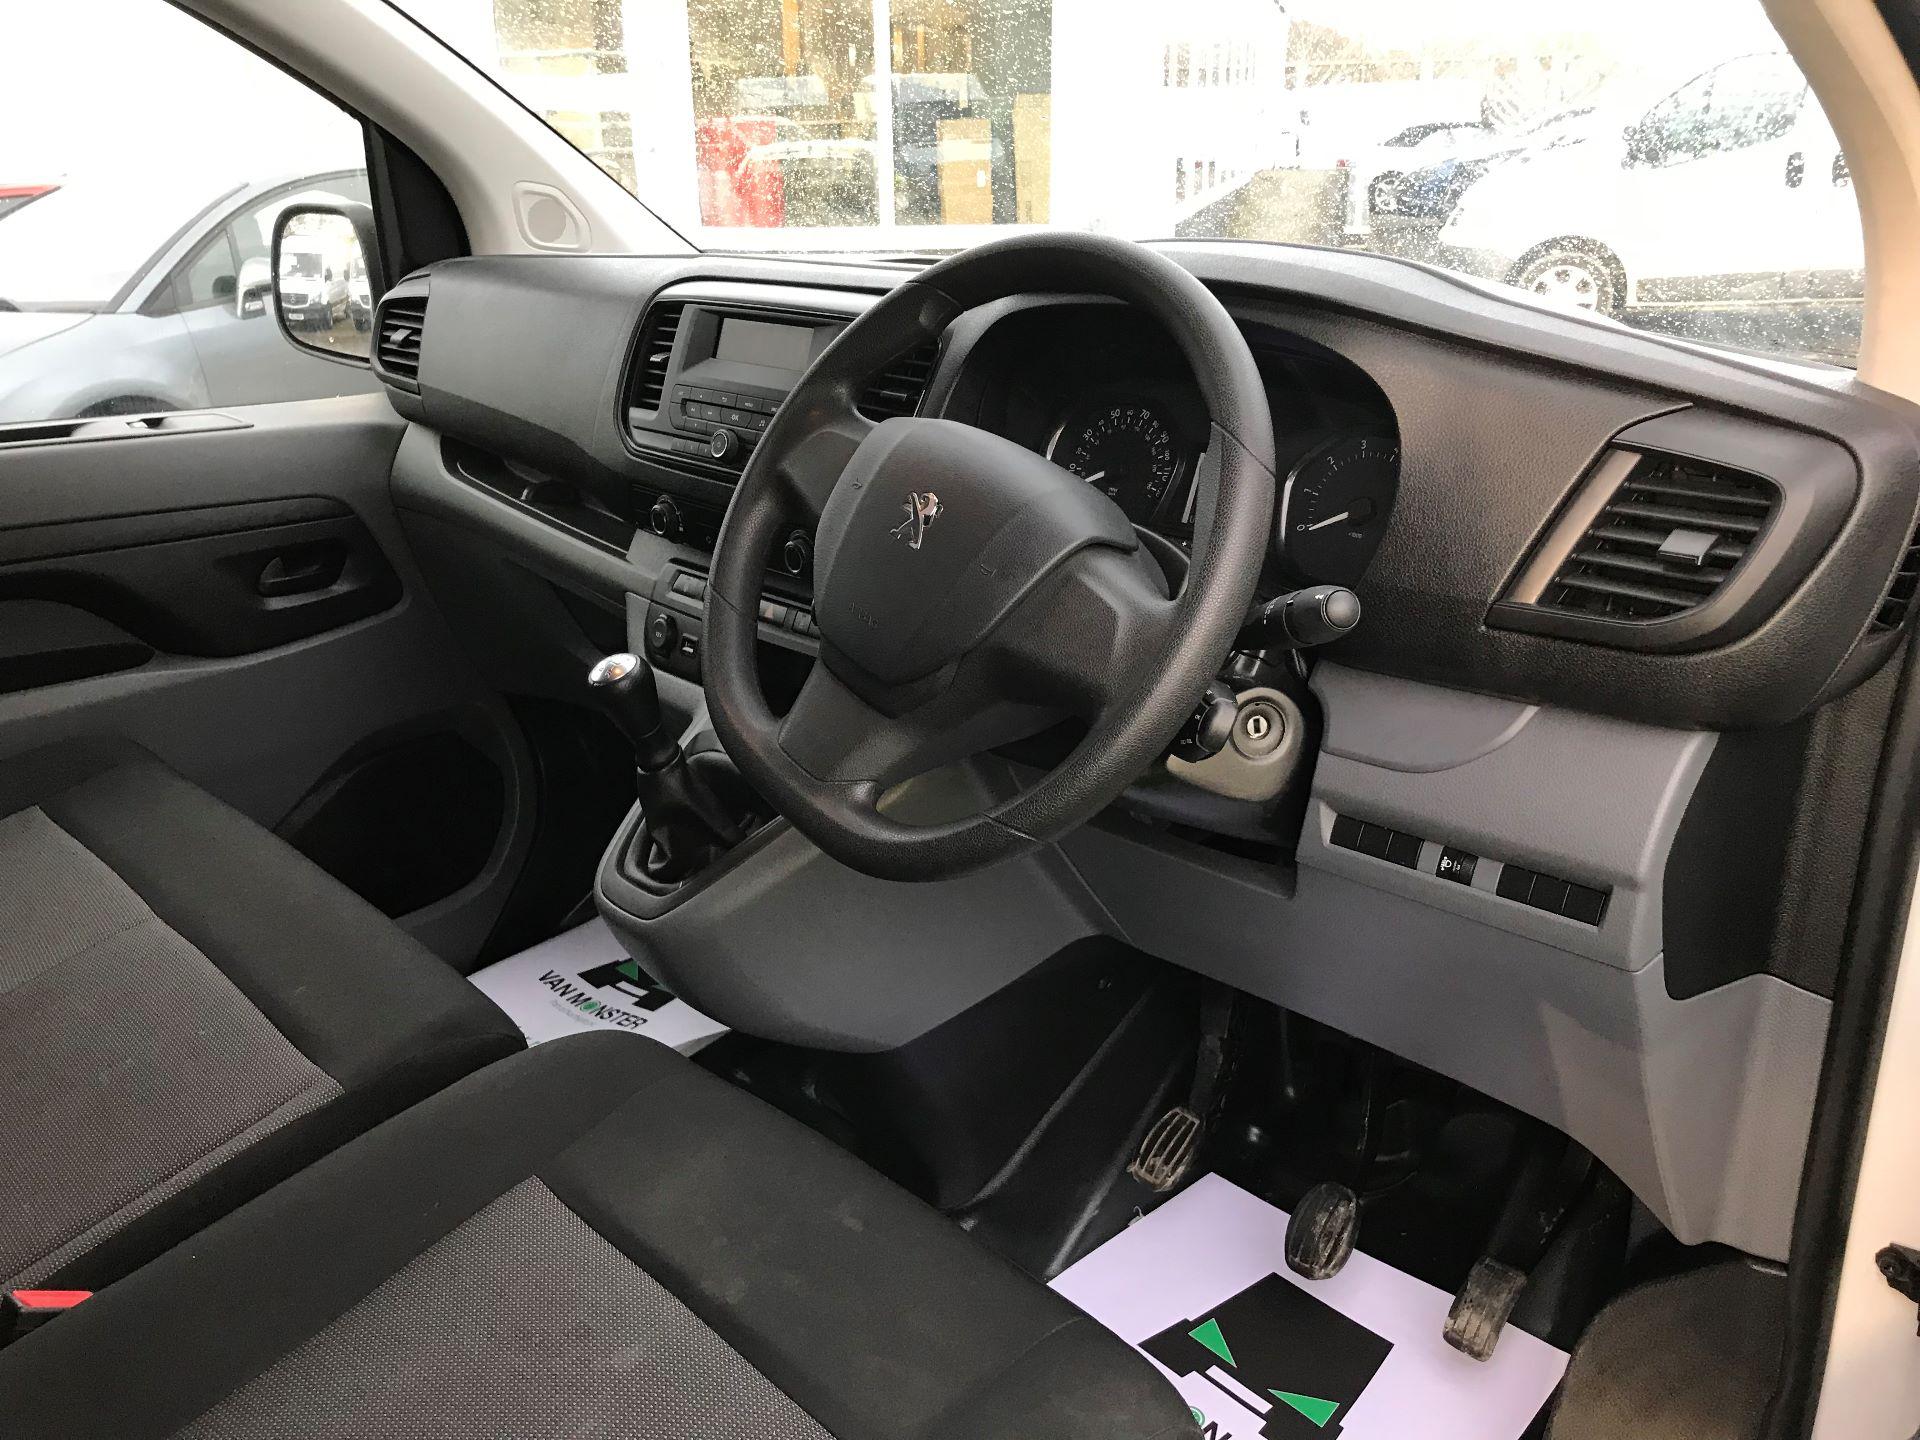 2018 Peugeot Expert  STANDARD 1000 1.6 BLUEHDI 95 S EURO 6 (NU18VTP) Image 16